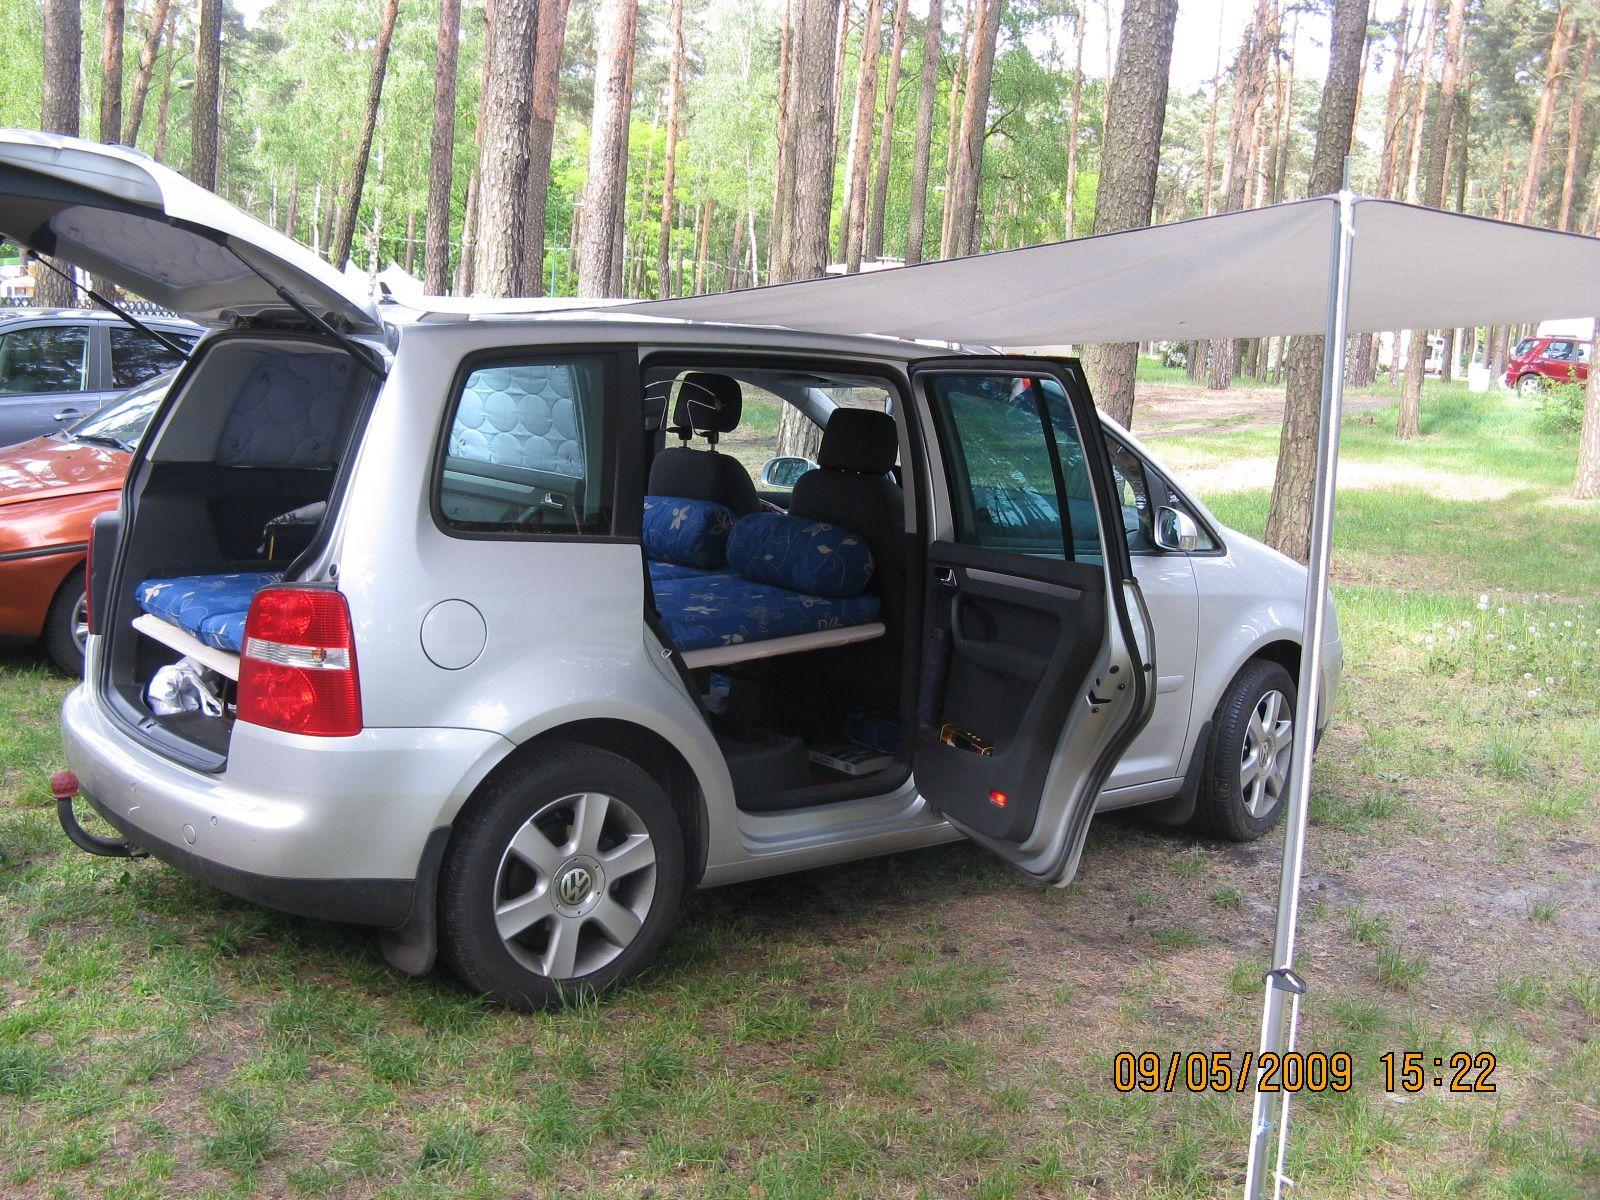 Private Homepage Familie Foschum Camping Ausbau Volkswagen Touran Campingbus Ausbau